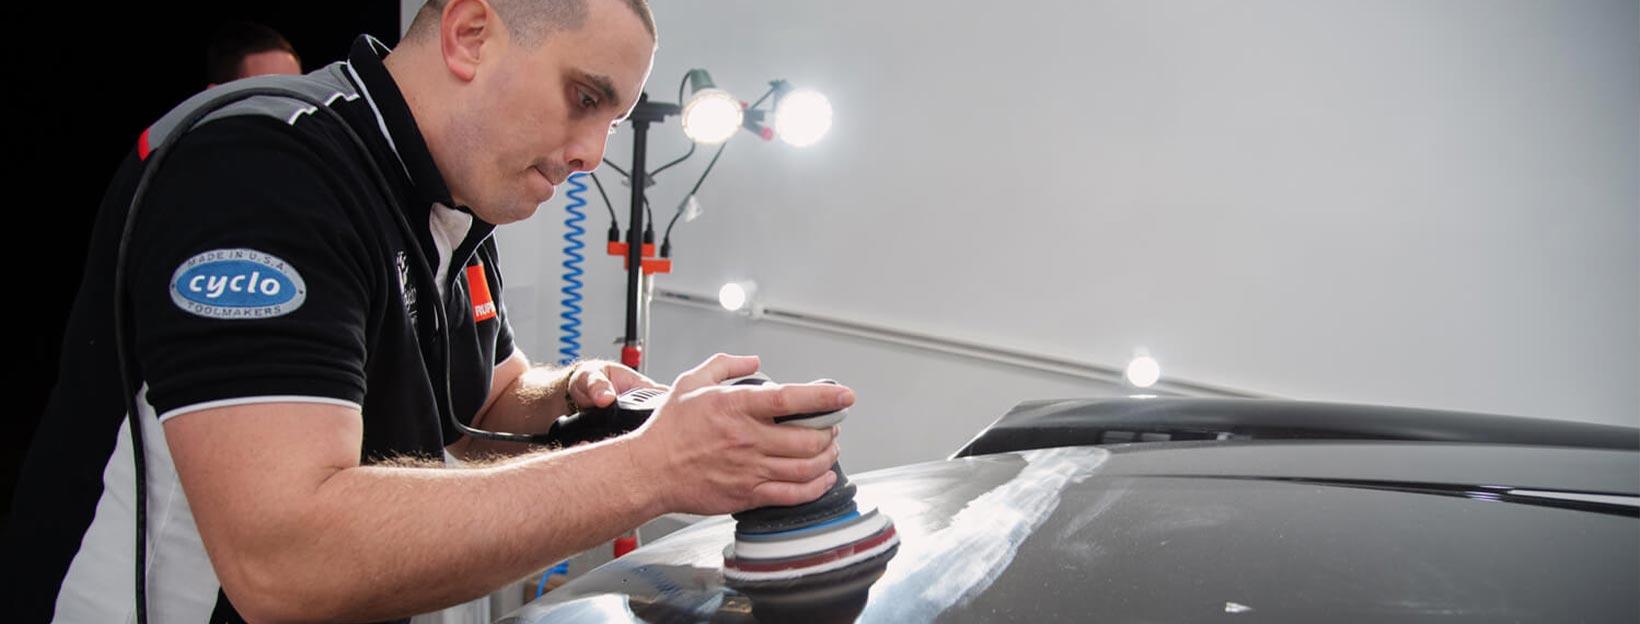 Paint correction before applying ceramic car coating